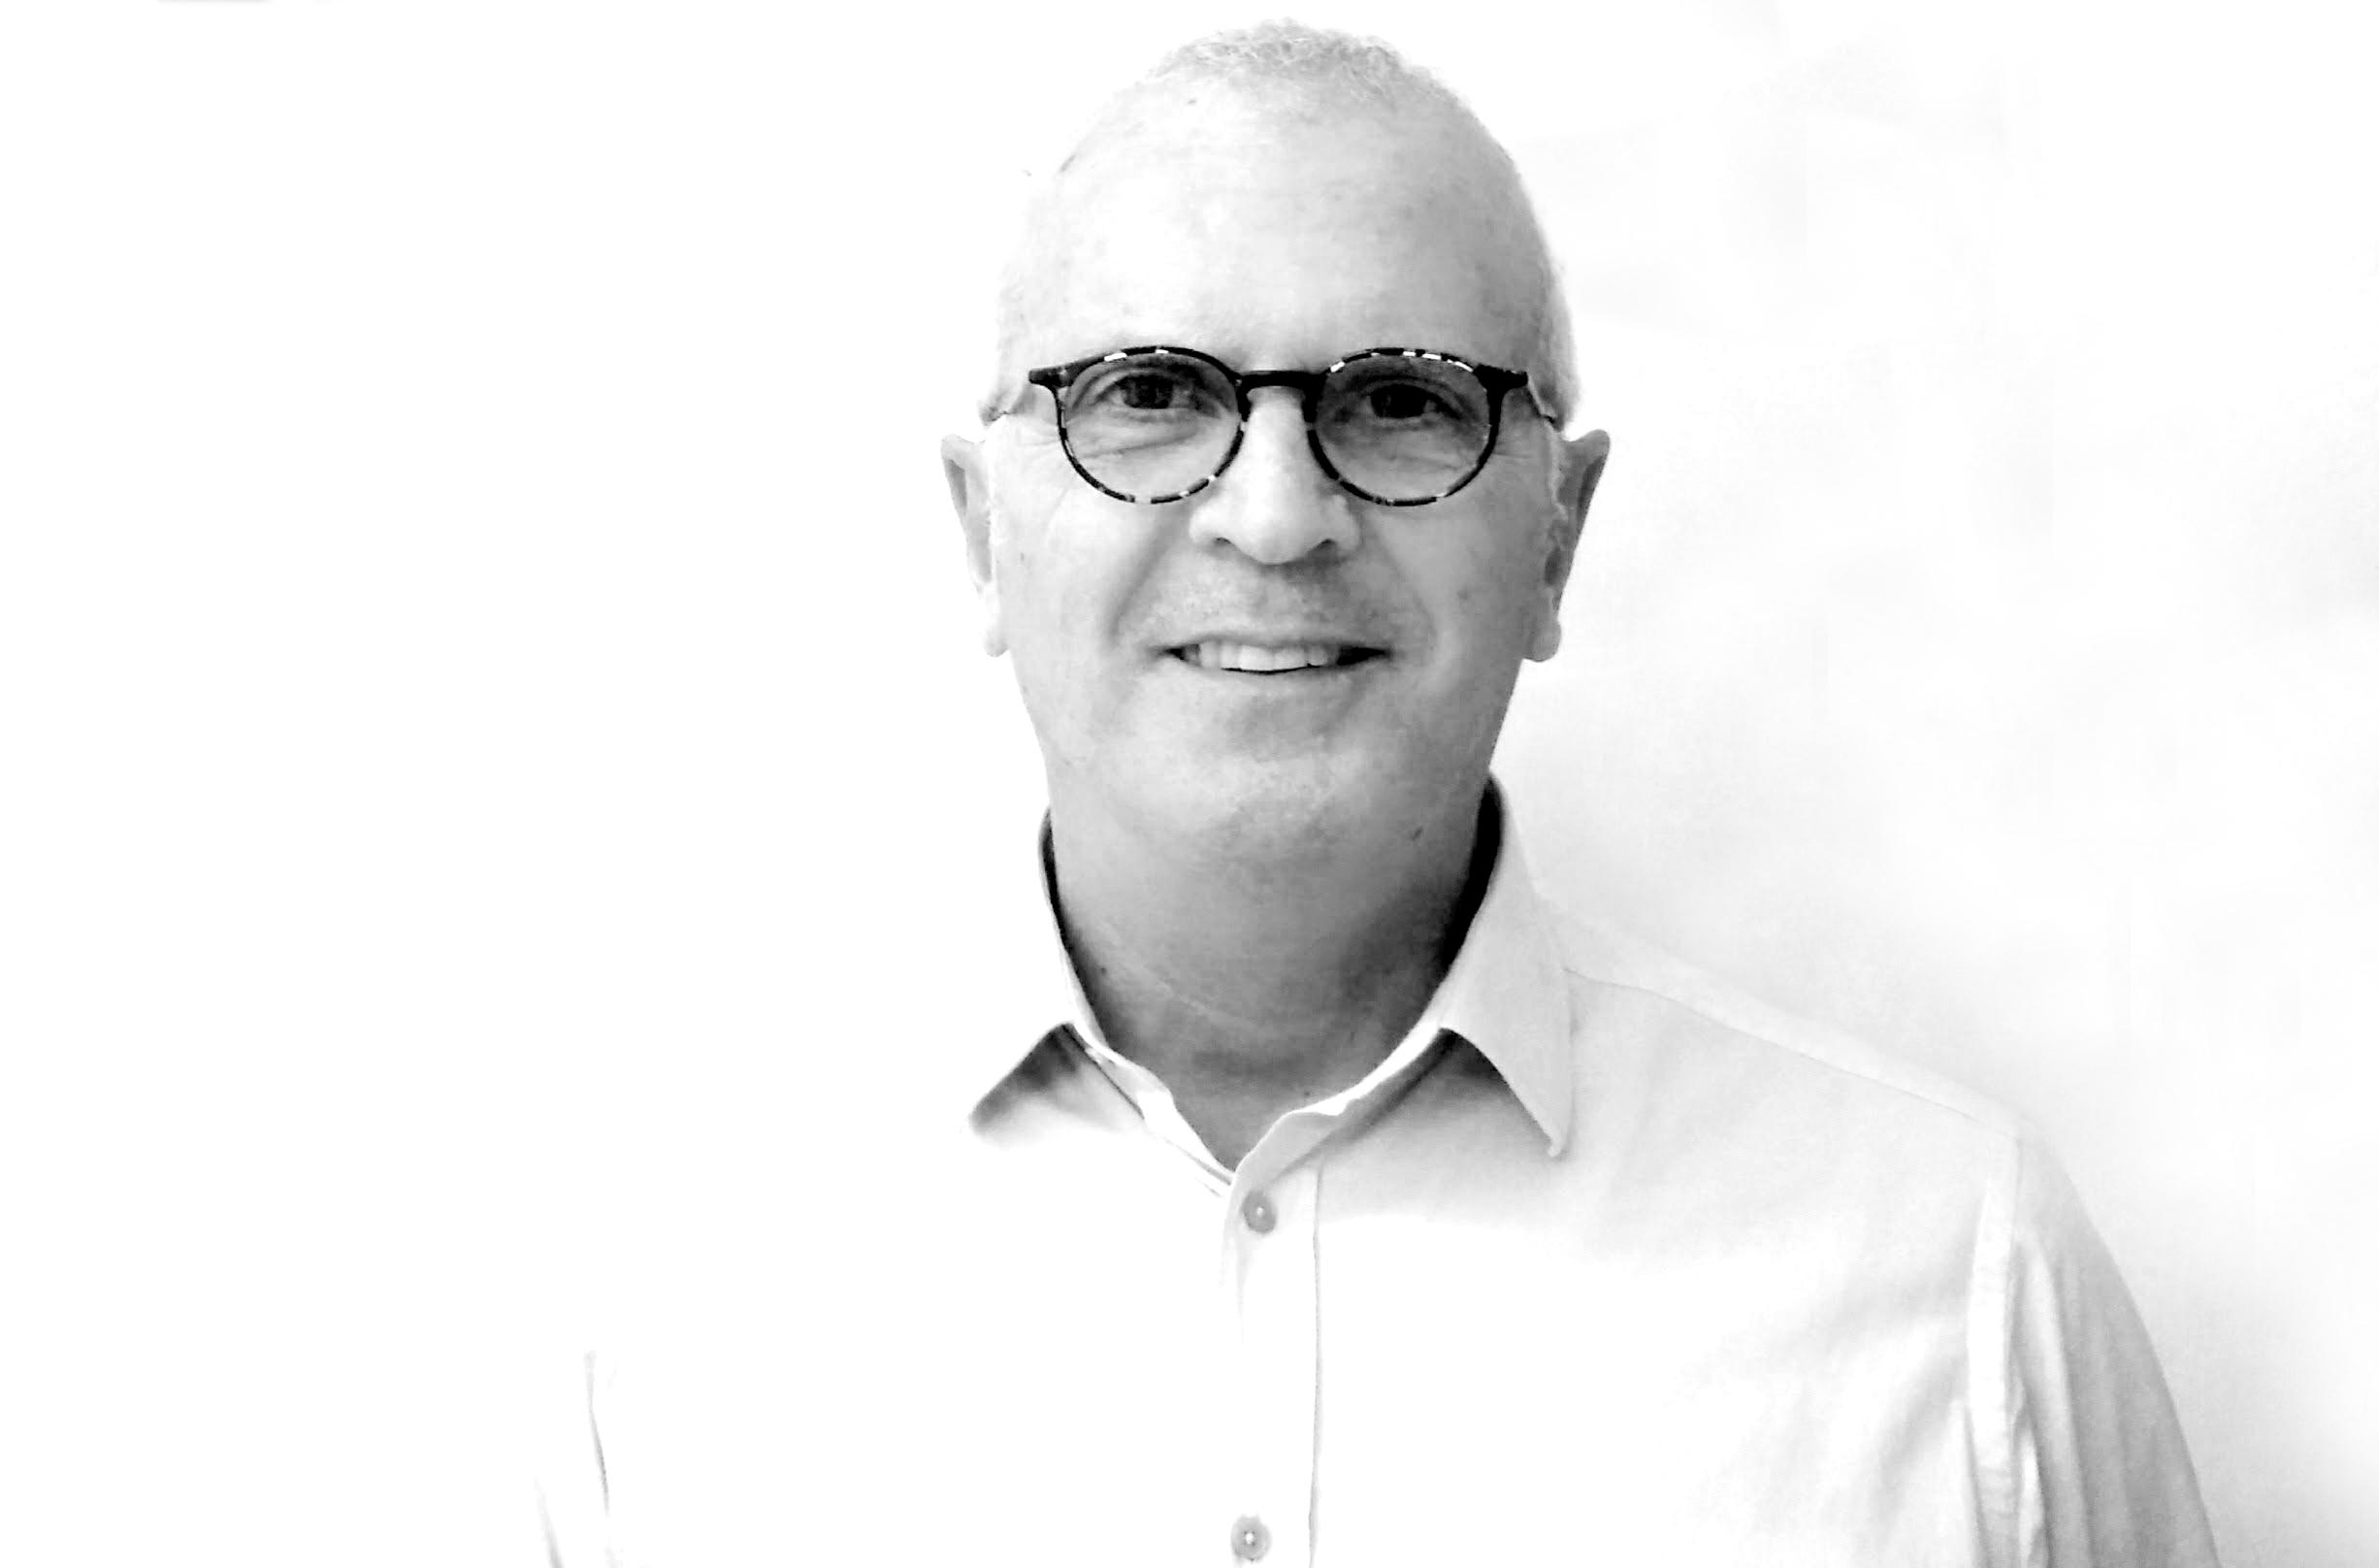 Biagio De Martinis